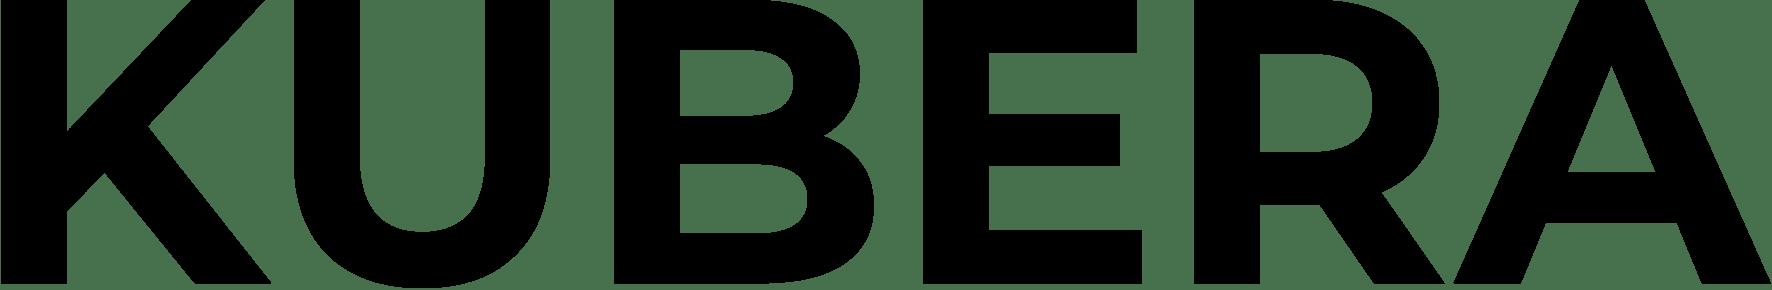 Logotipo de Kubera